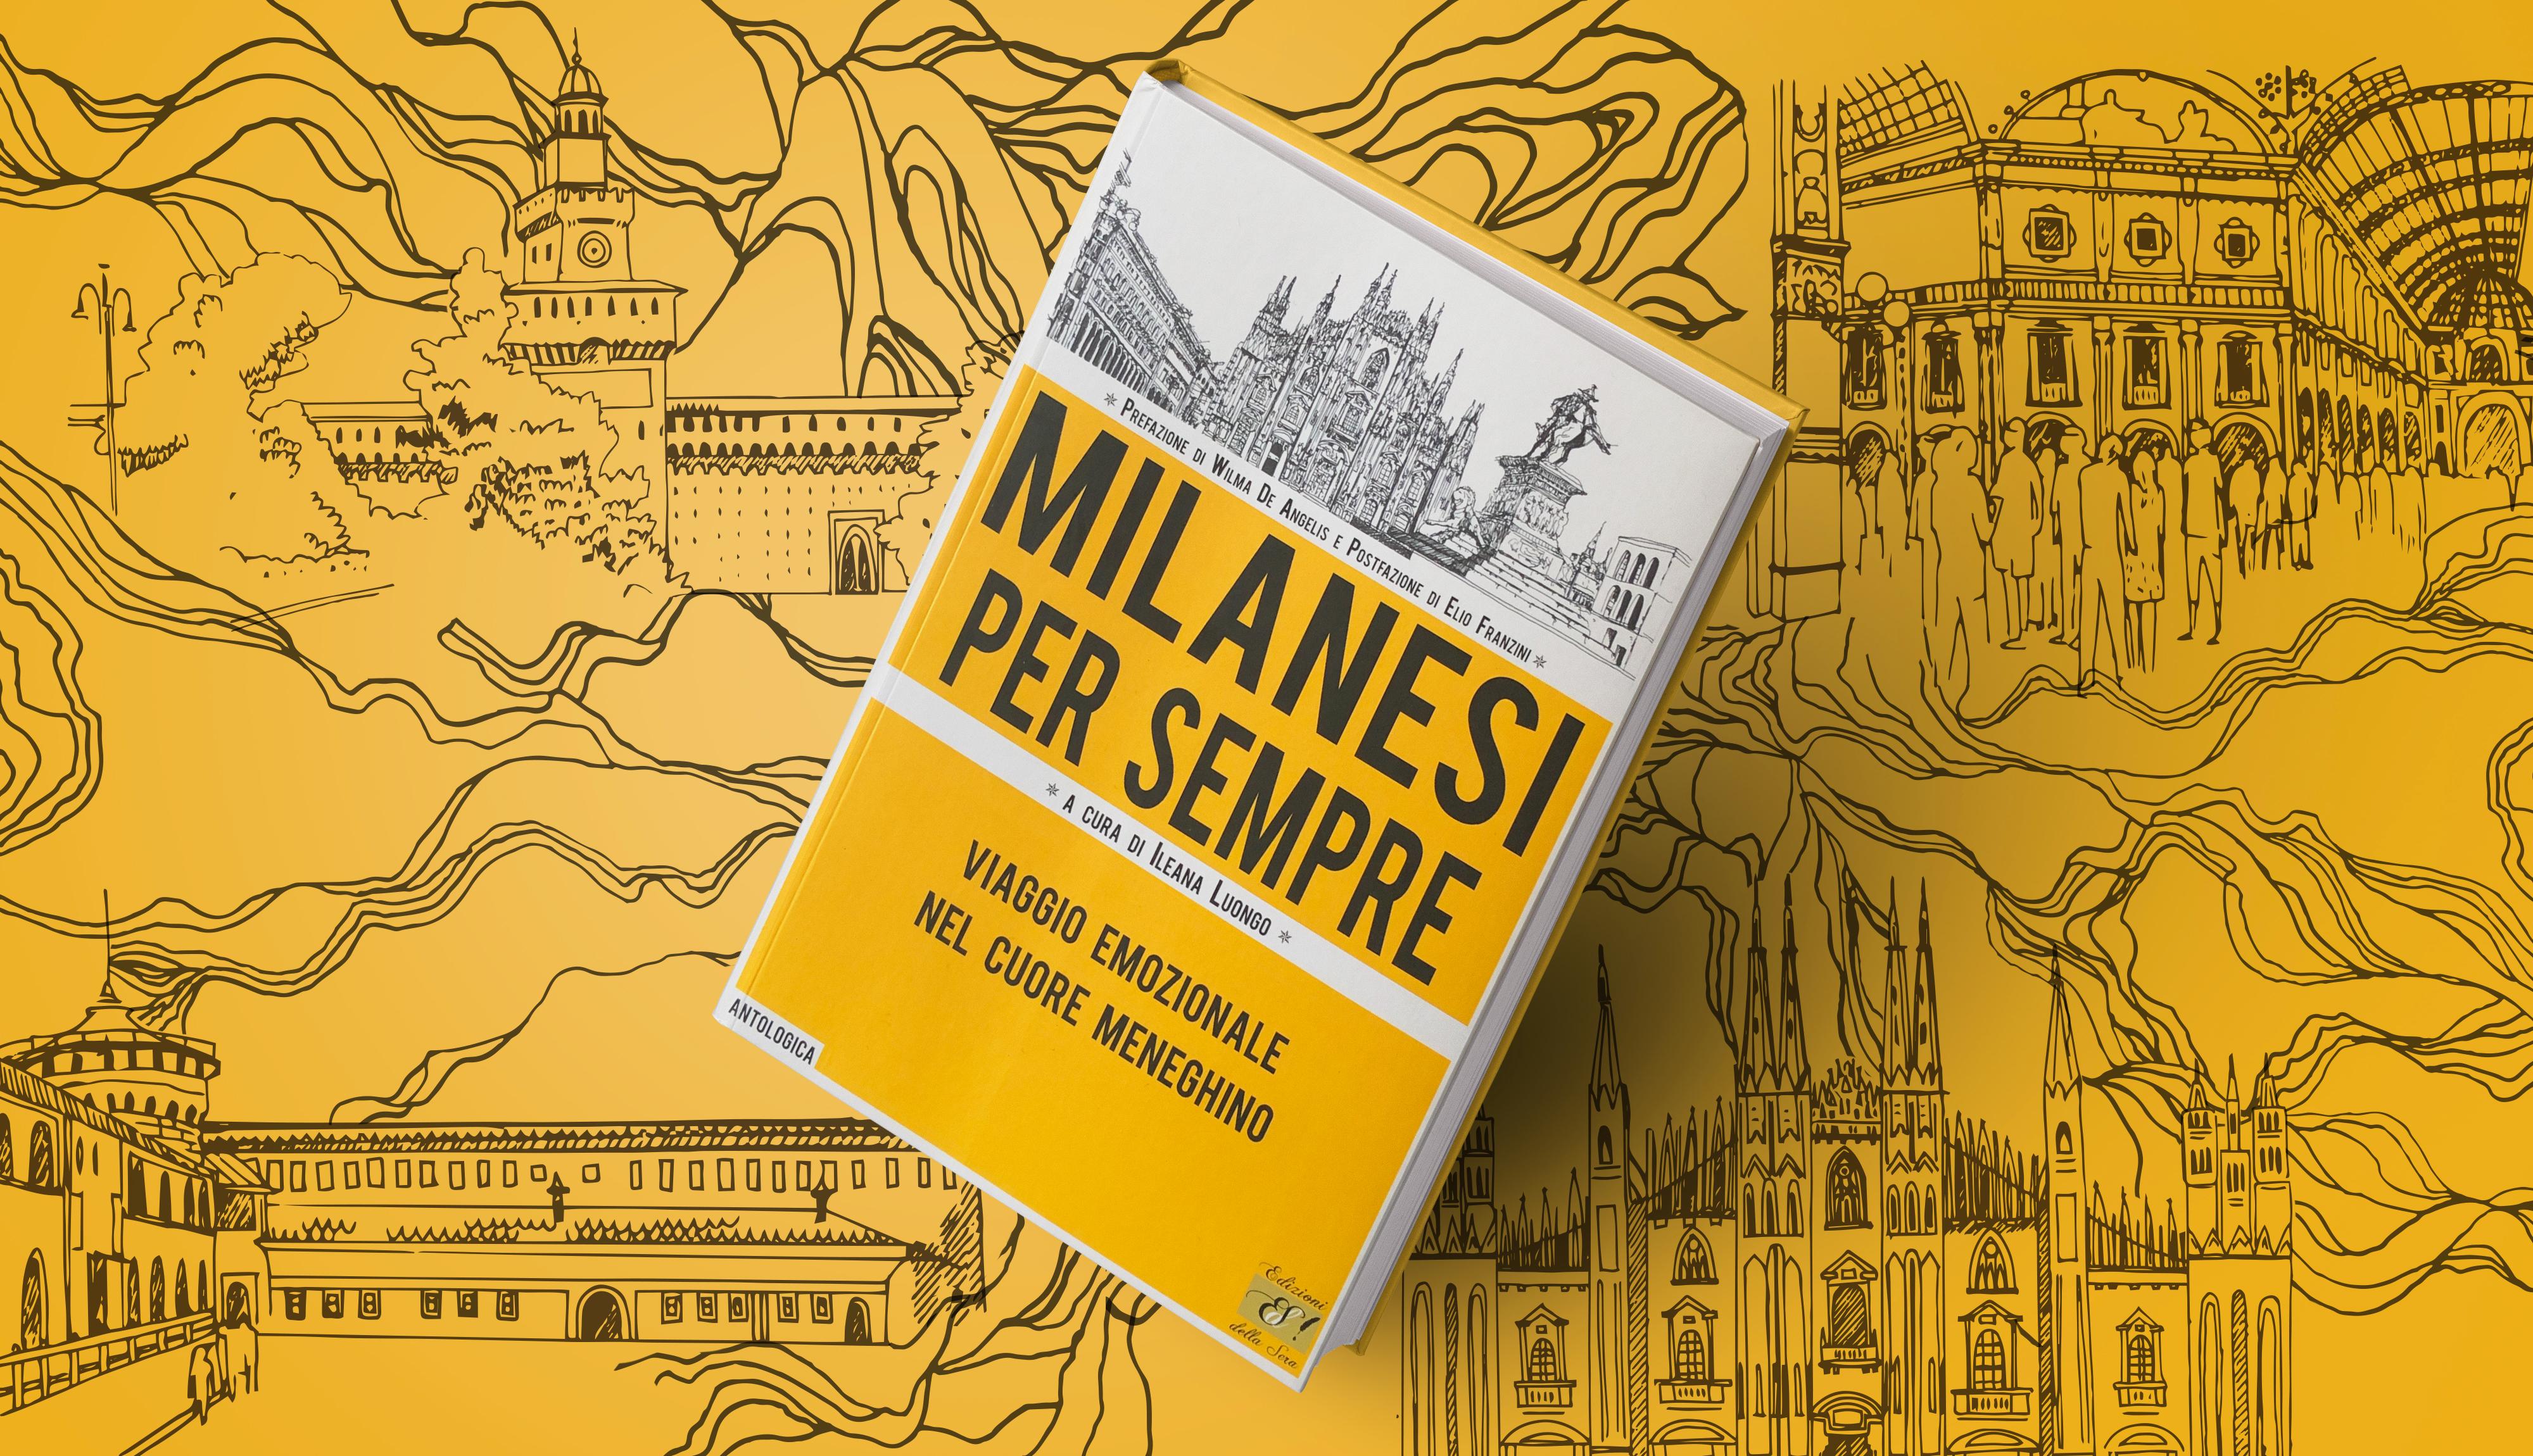 Milanesi per sempre: antologia polifonica su una città unica